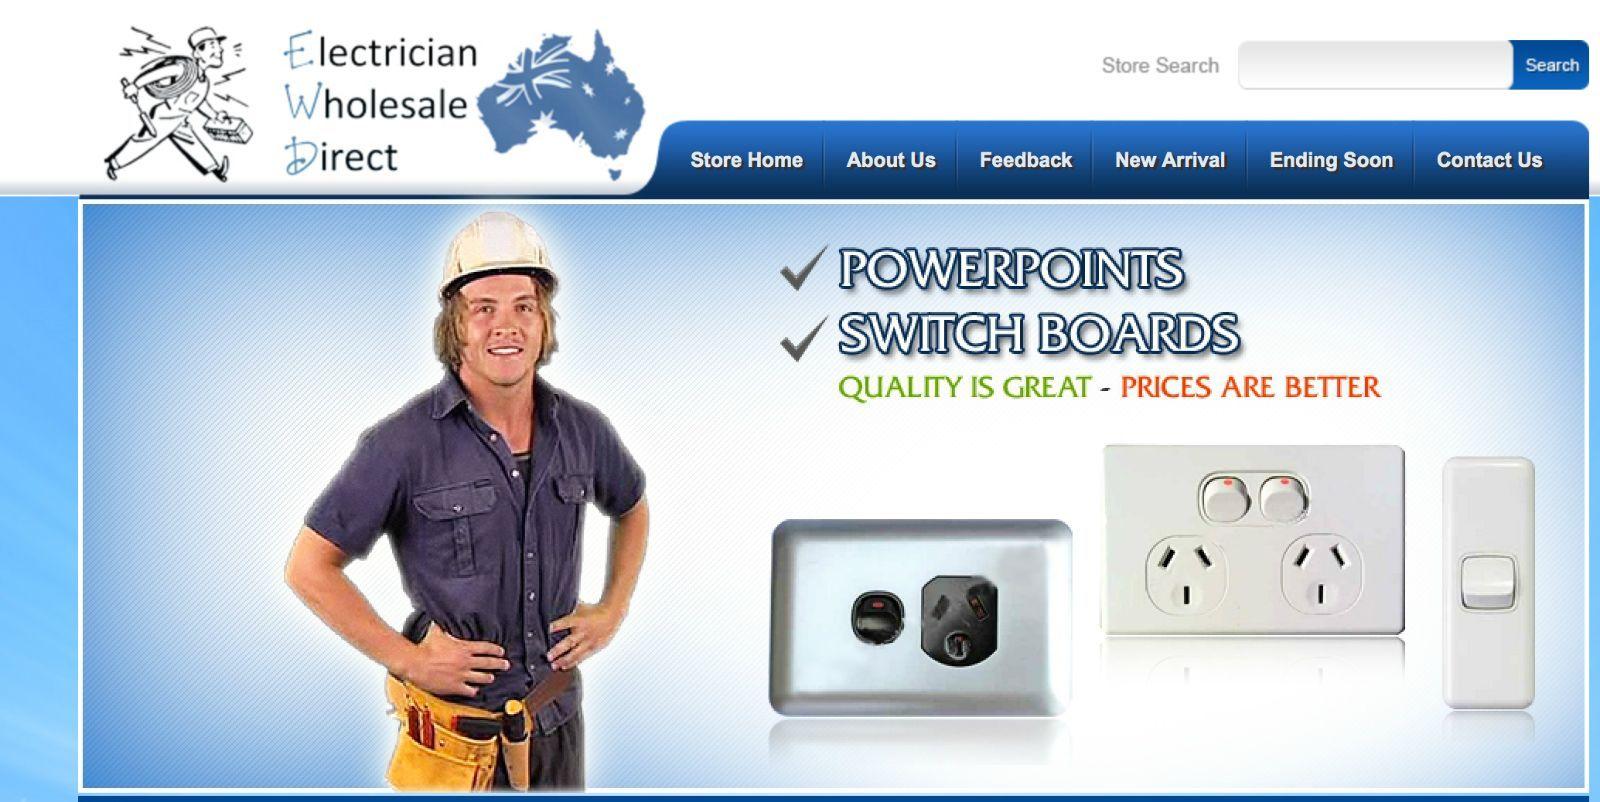 5 Pin 50 Amp Rcd Protected Combination Outlet Weatherproof Caravan Wiring Diagram Sale